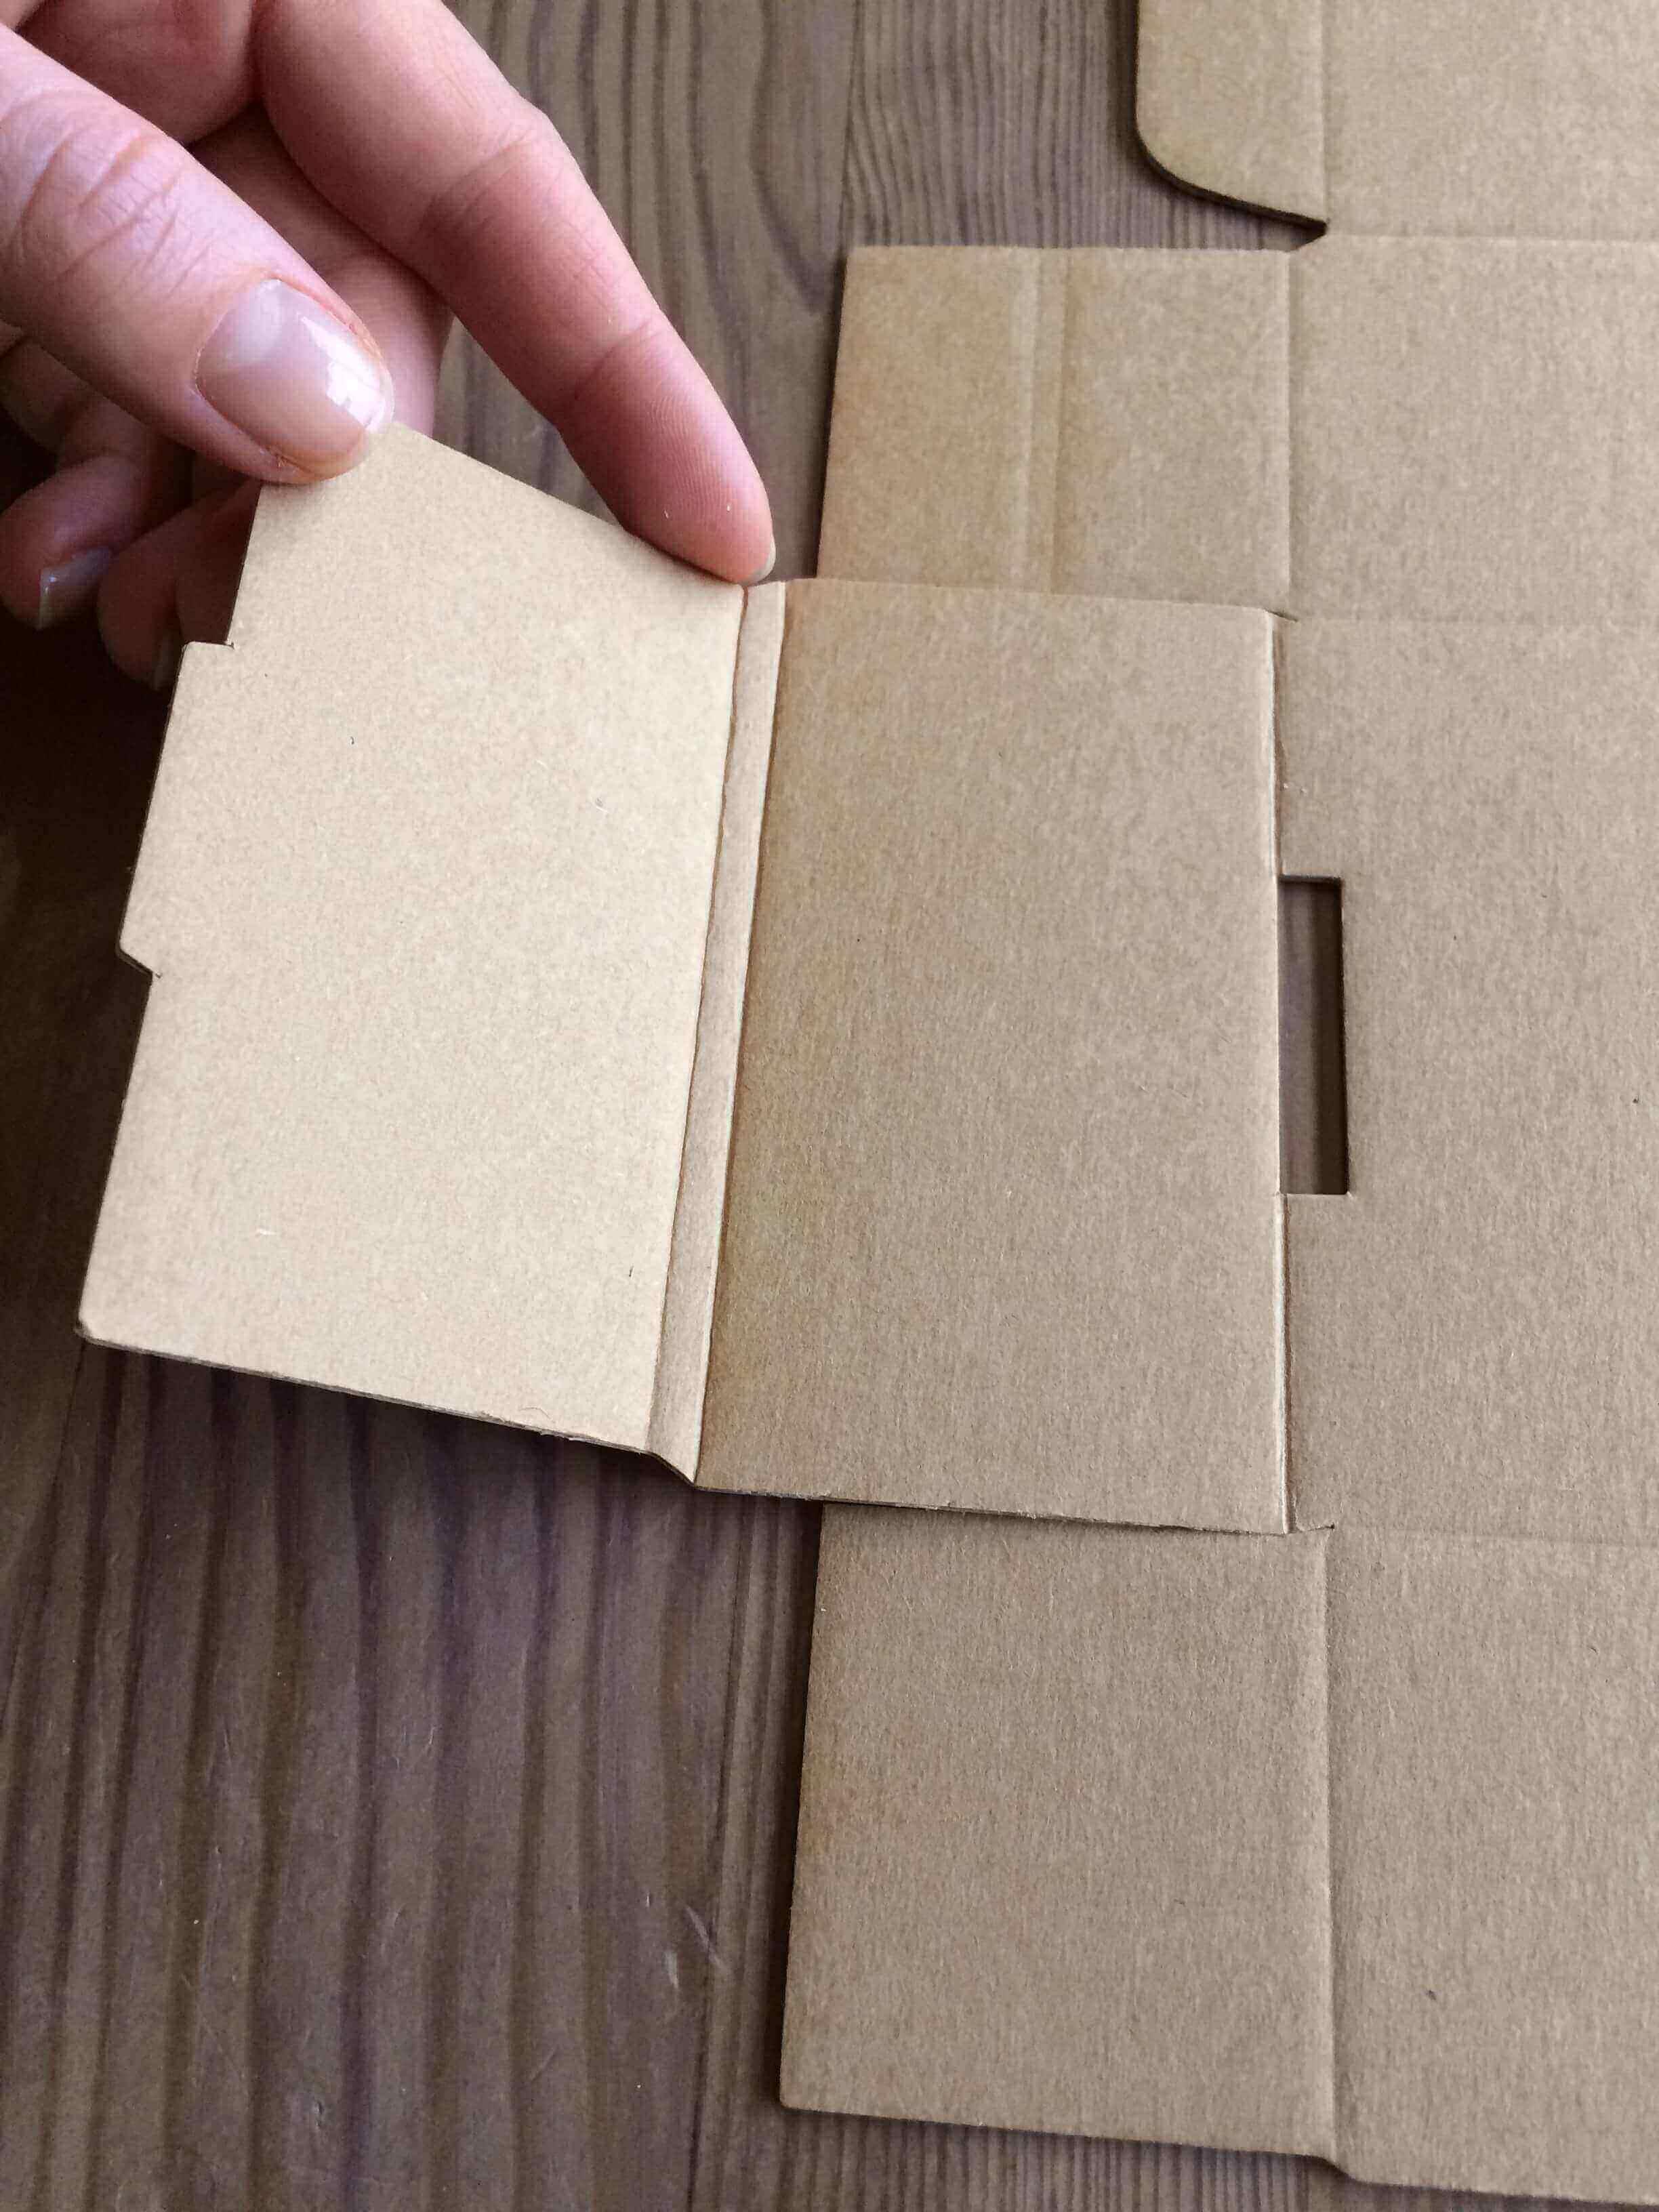 folding boxes_packhelp_3